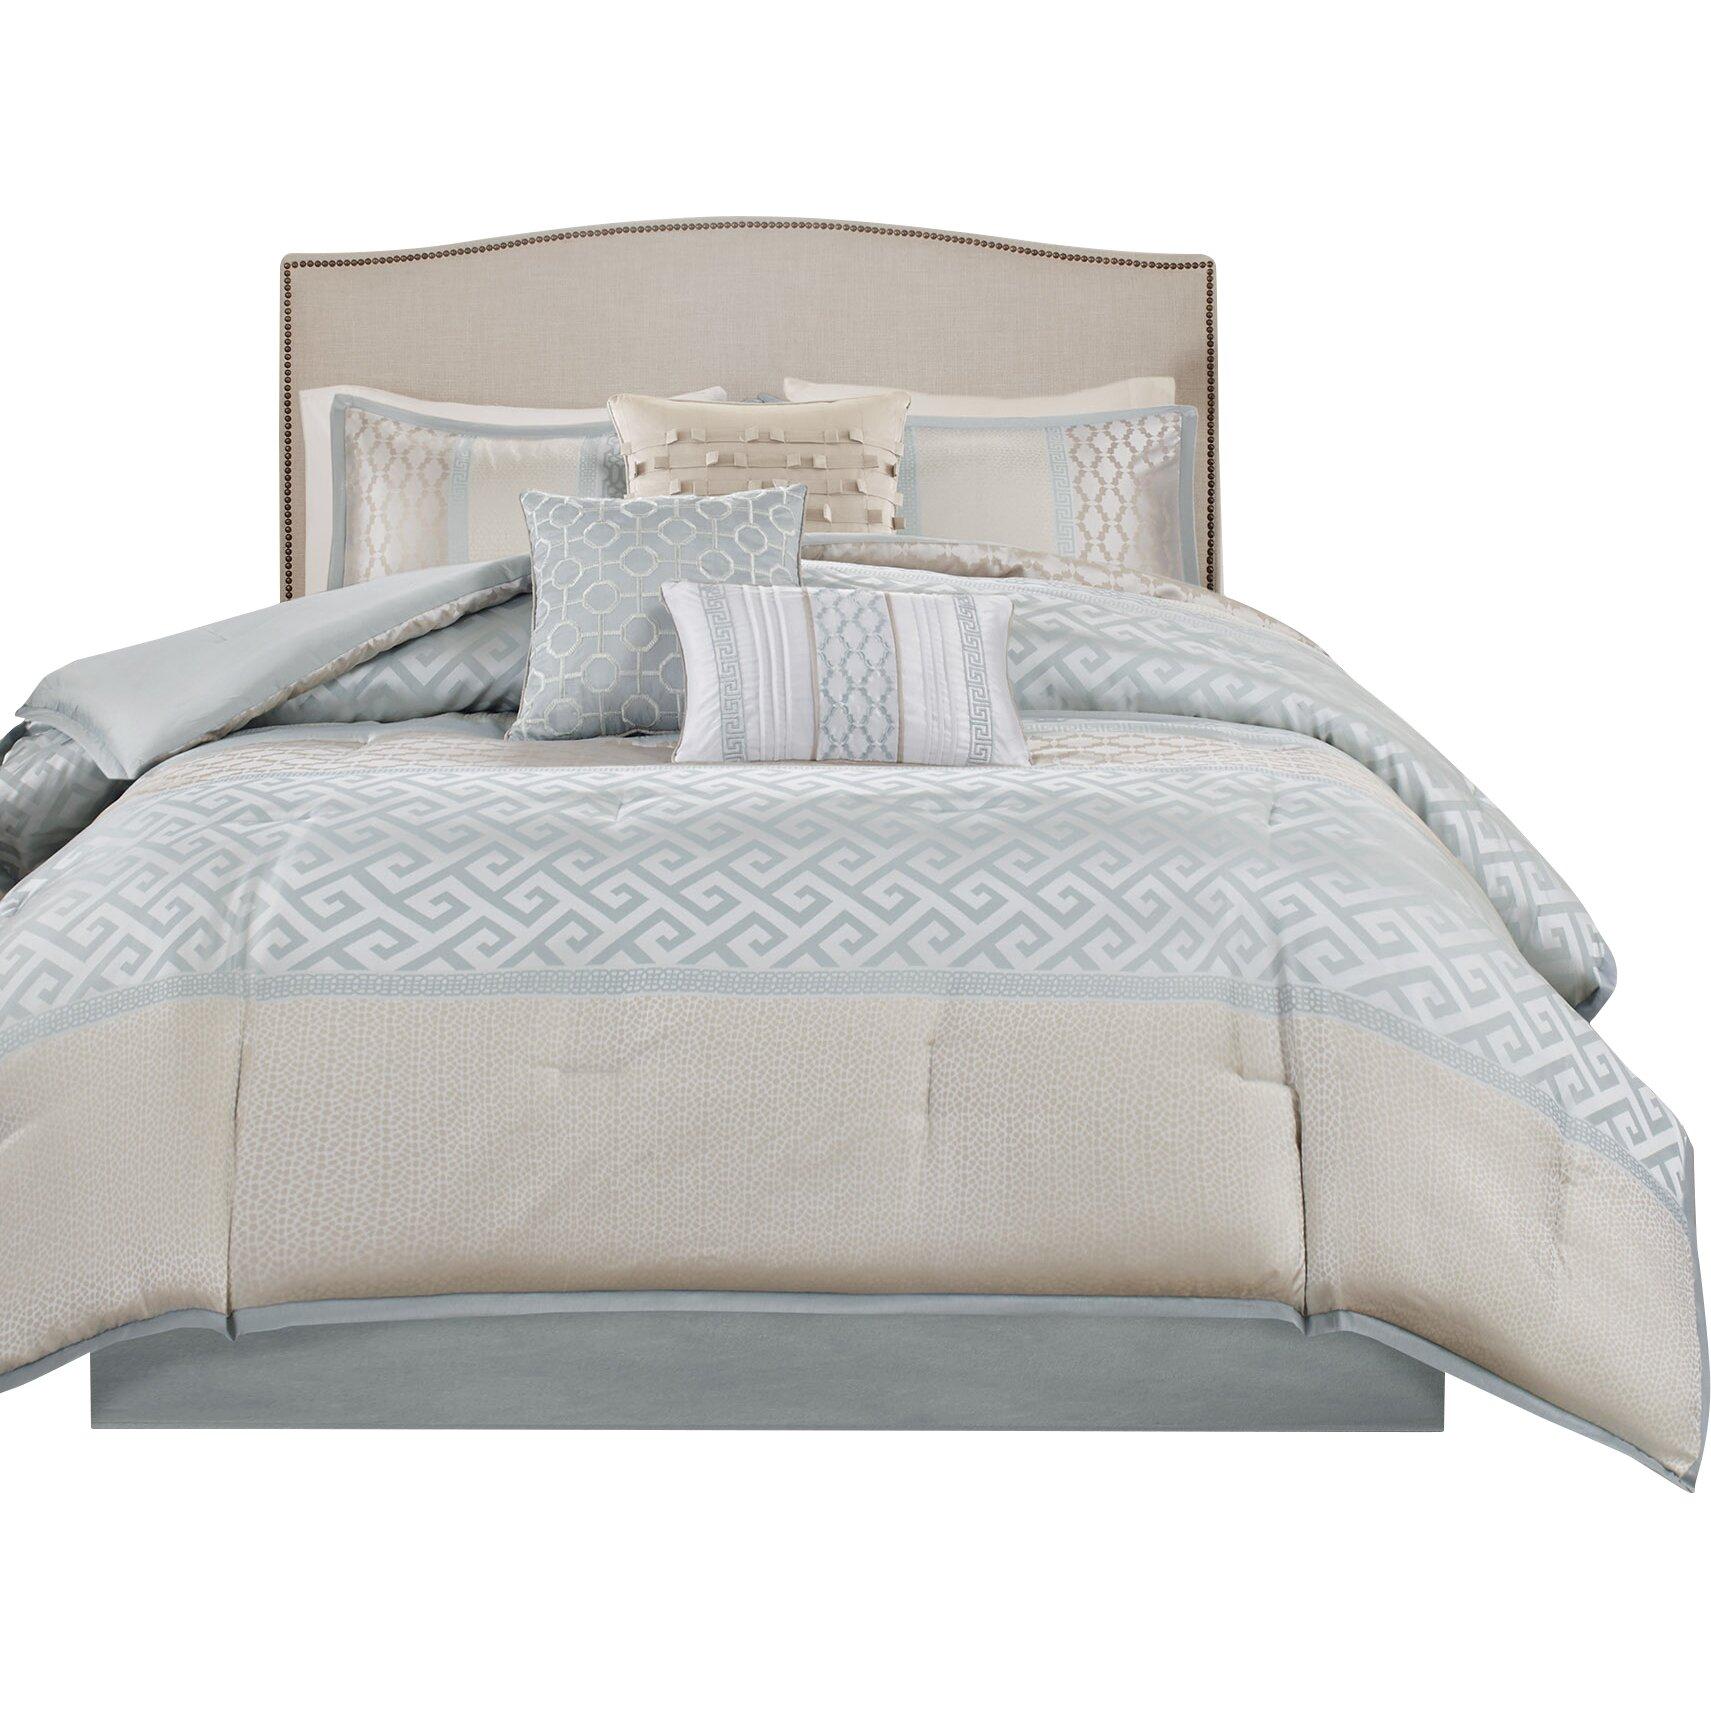 House of hampton wilde 7 piece comforter set reviews for House of hampton bedding